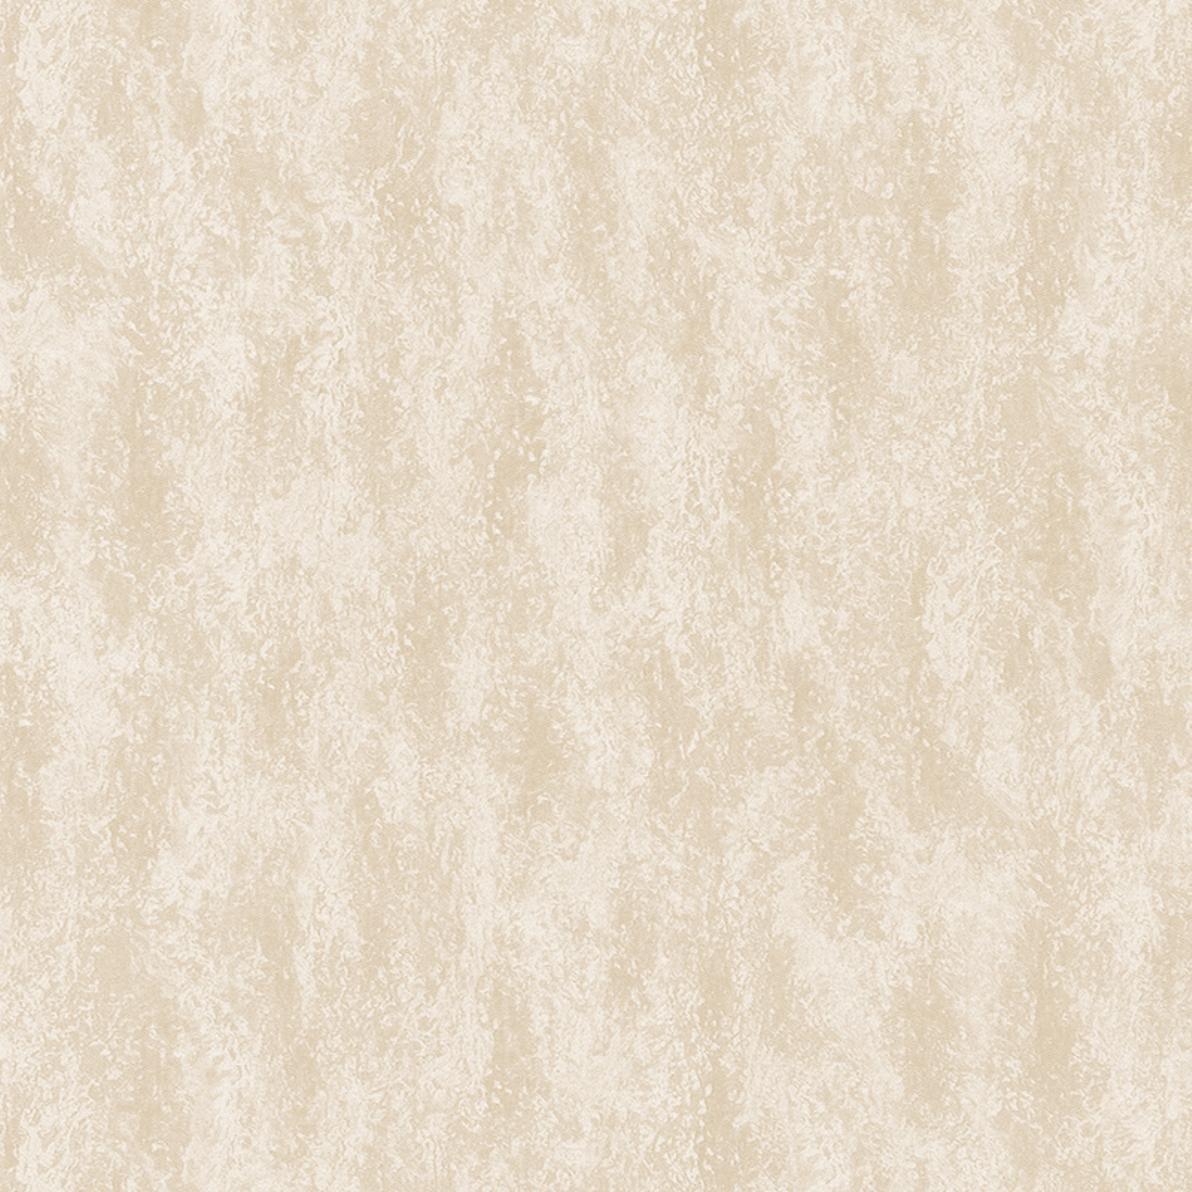 Обои Decori & Decori Bukhara 82792